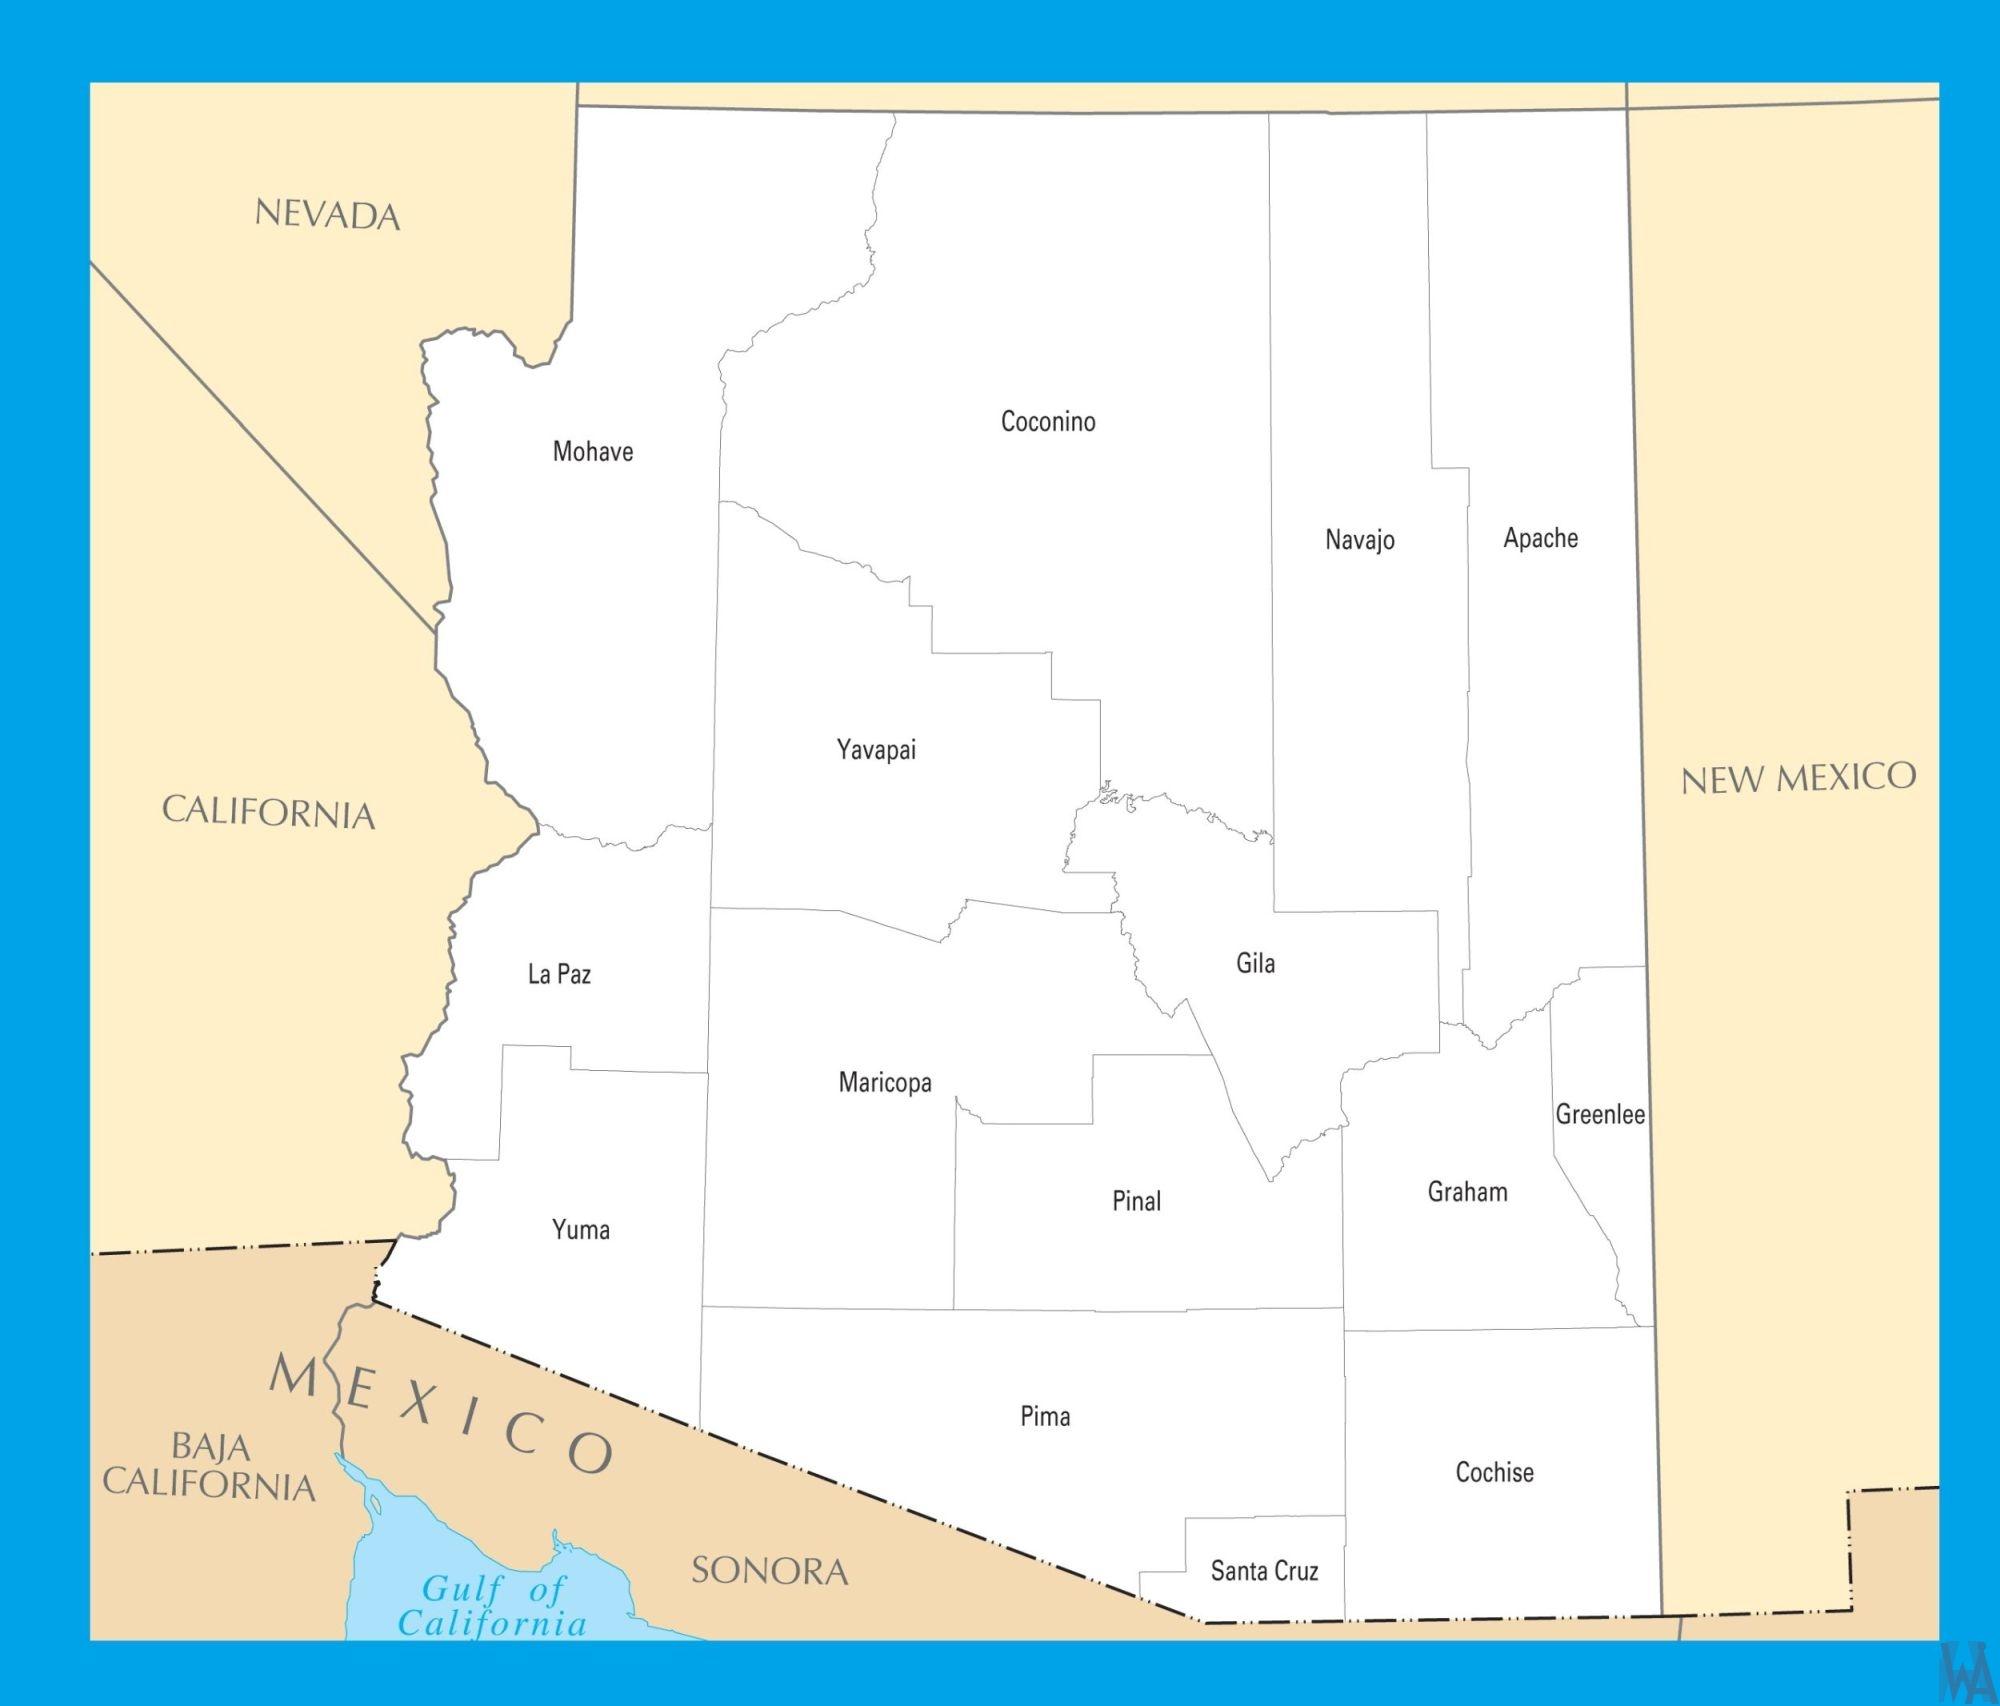 Arizona County  Map |  County Map of Arizona = 1